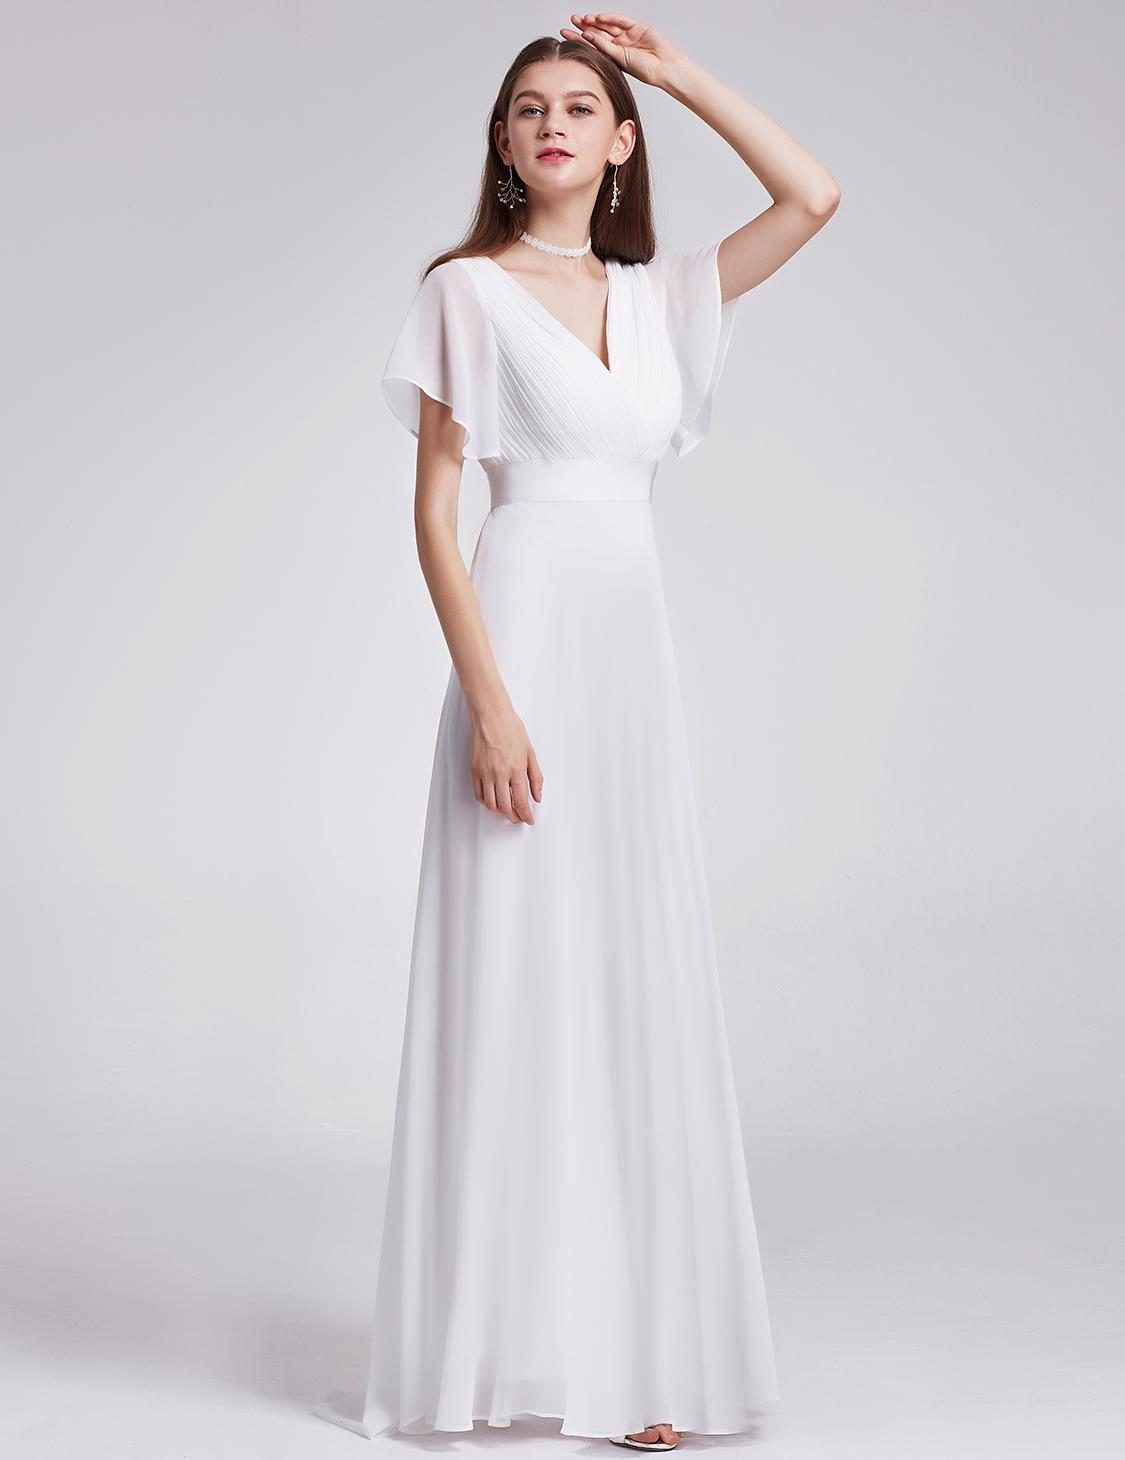 Cool Ever Pretty White Formal Evening Weddings Bridesmaid